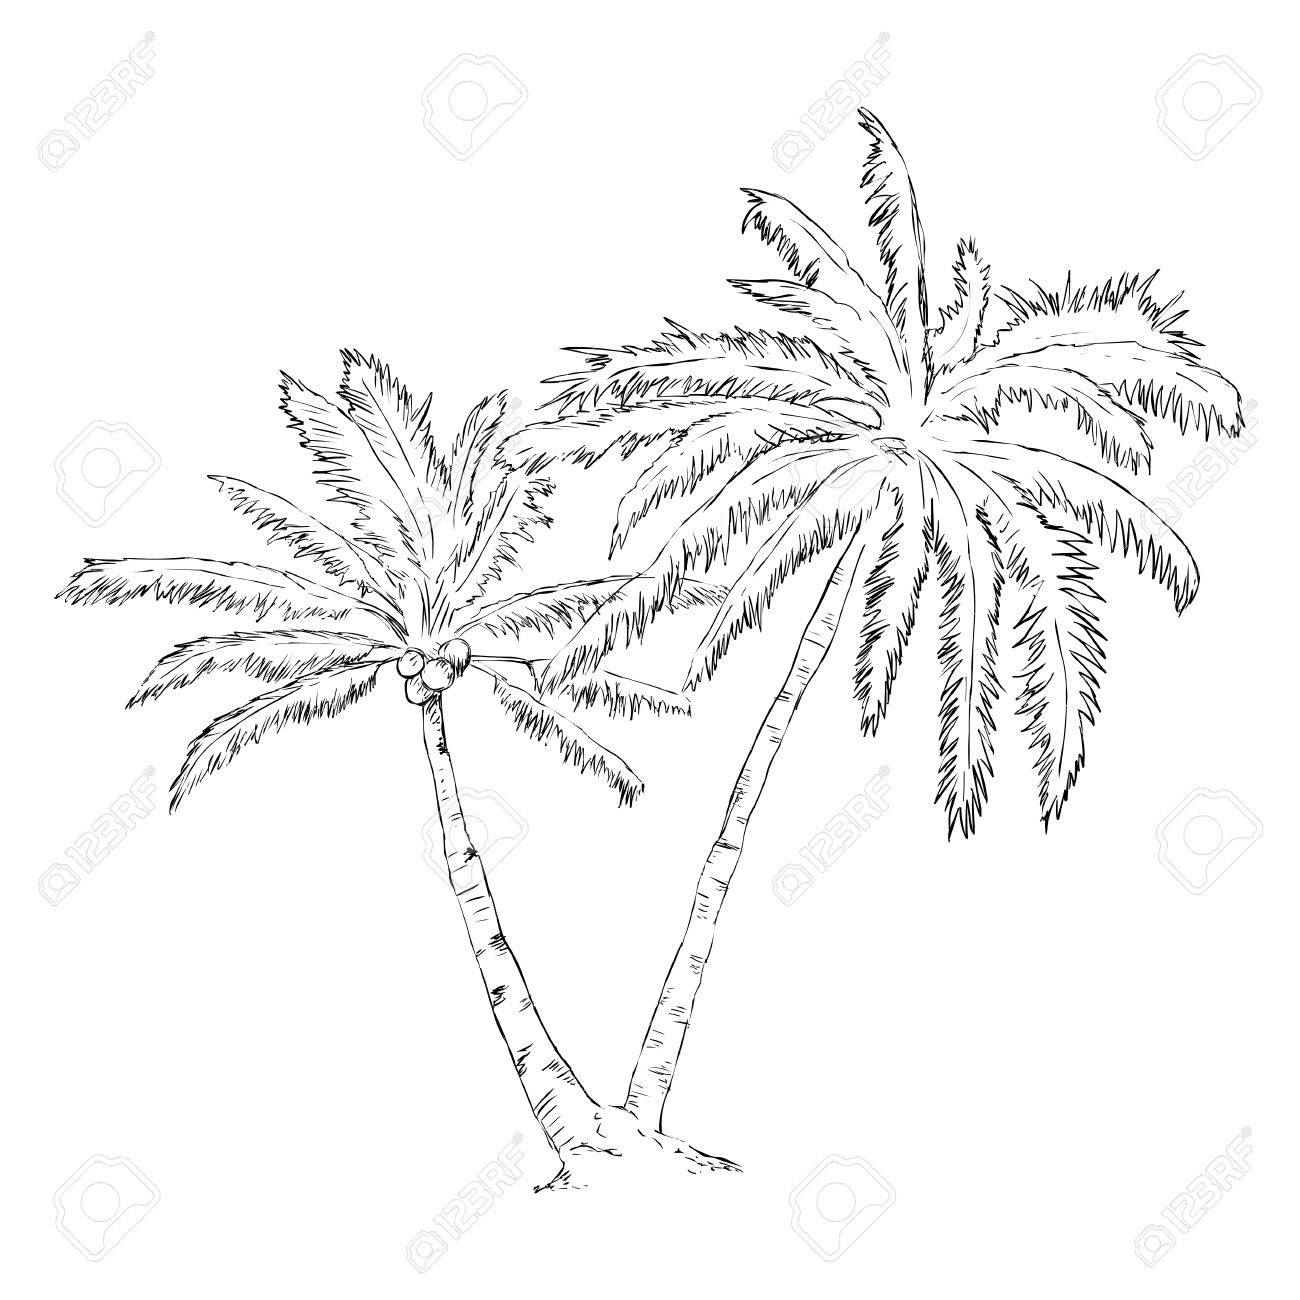 1300x1300 Vector Single Sketch Palm Tree Royalty Free Cliparts, Vectors,